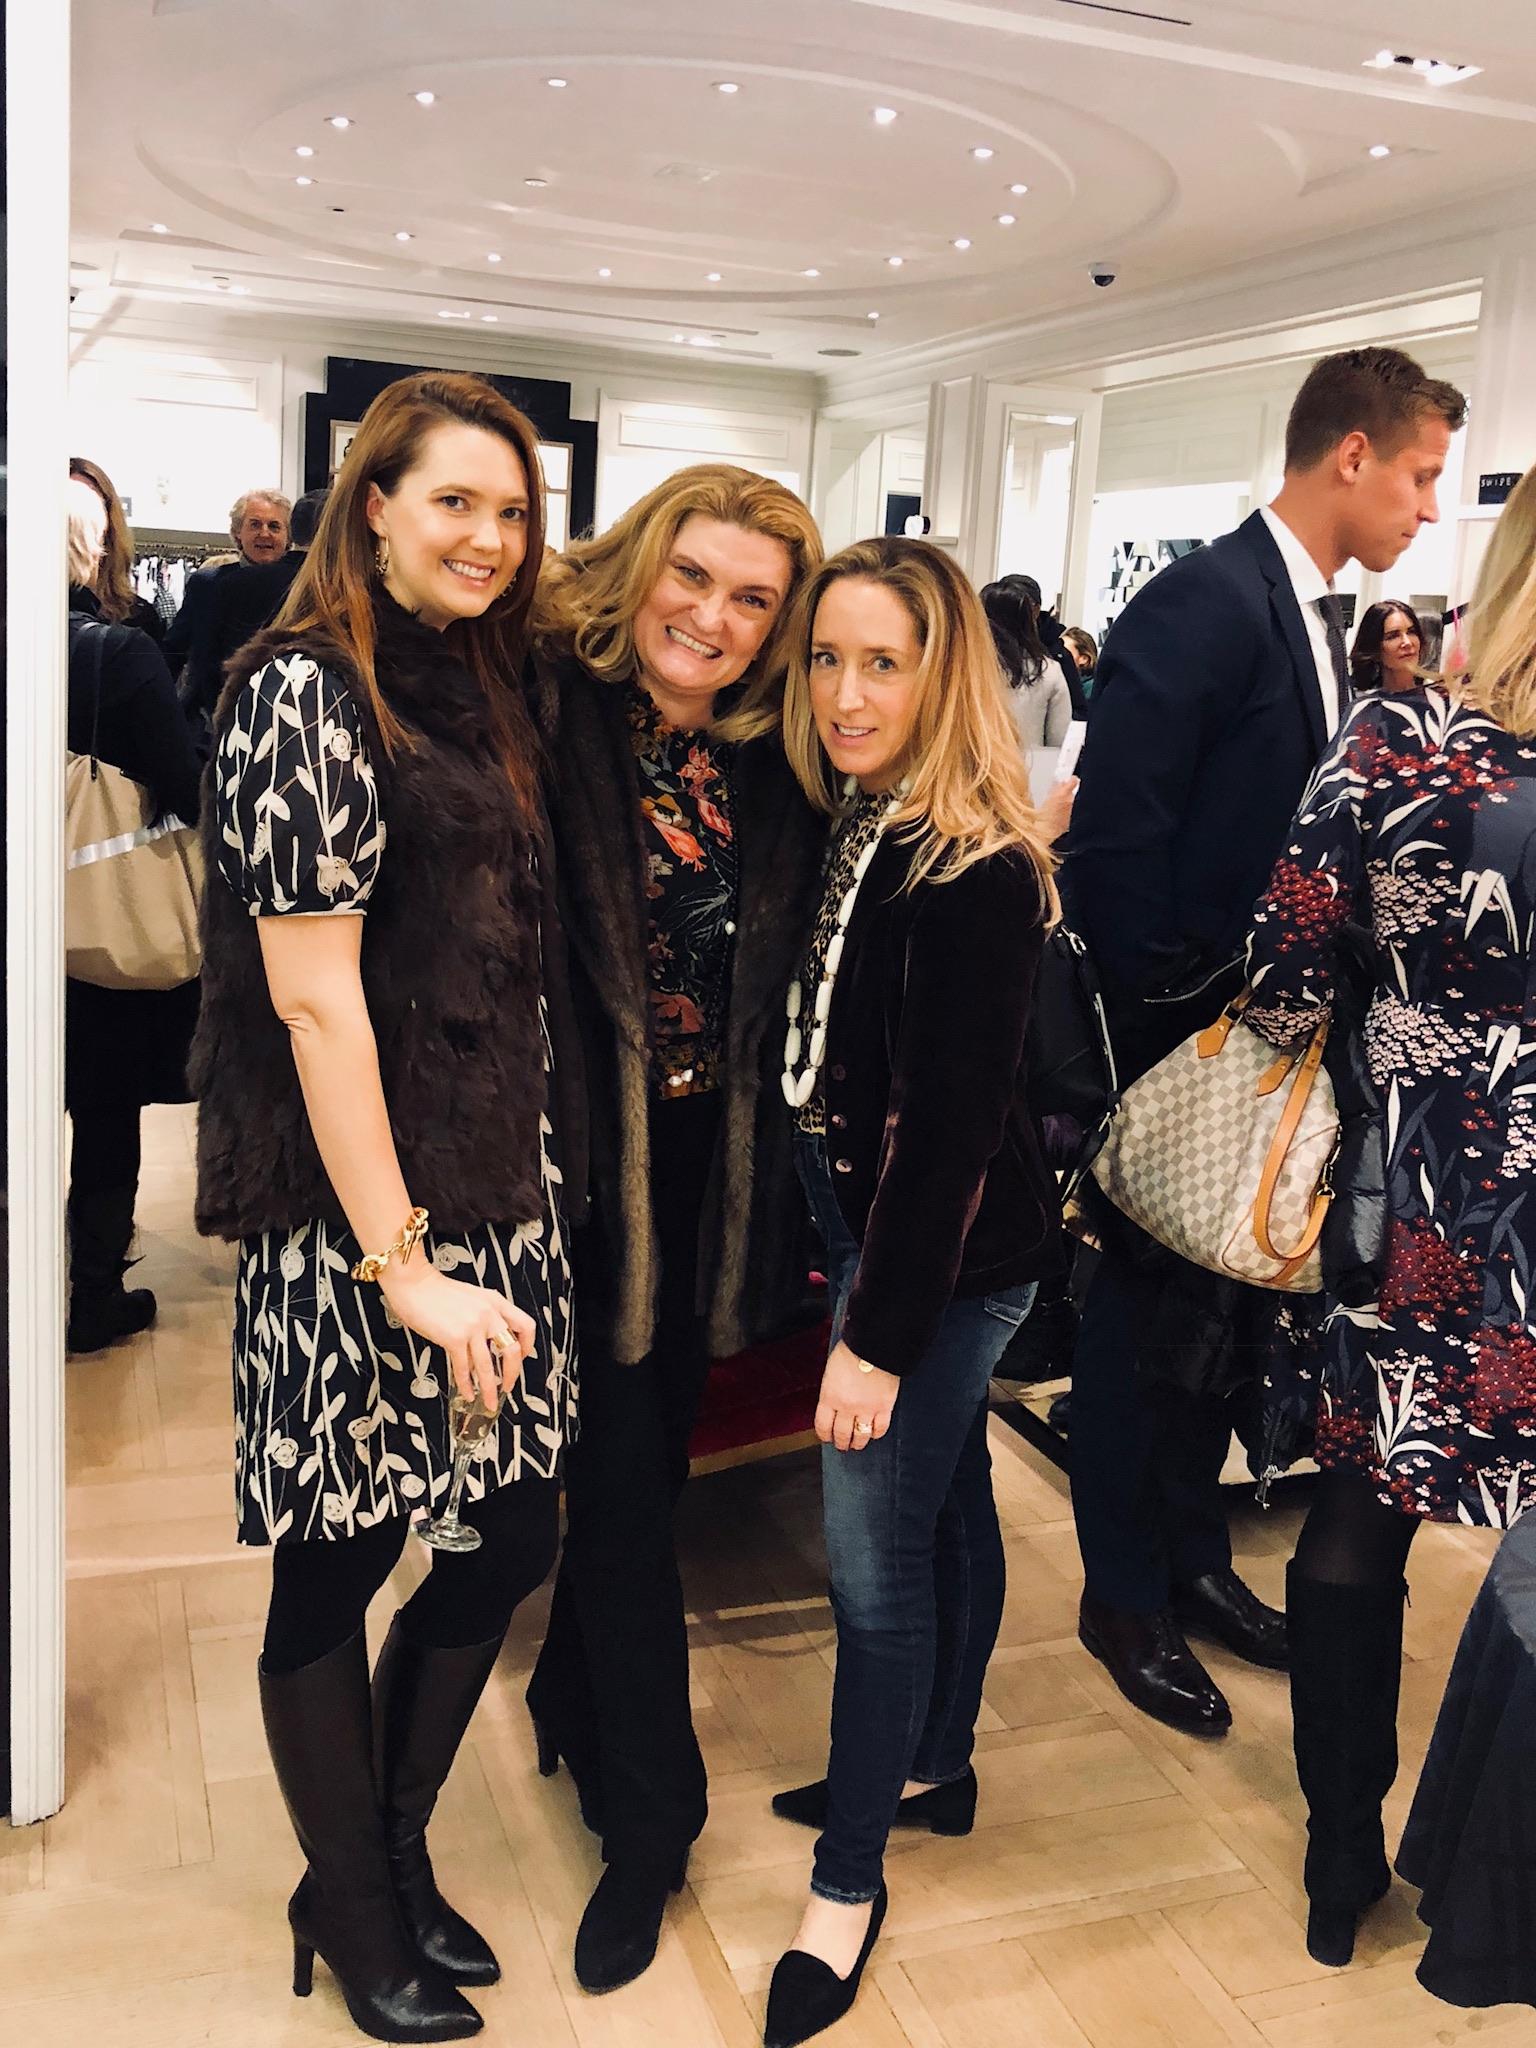 Kori Mallett, Melanie Holland, owner of MSH &Partners   Susan Swimmer  , fashion editor